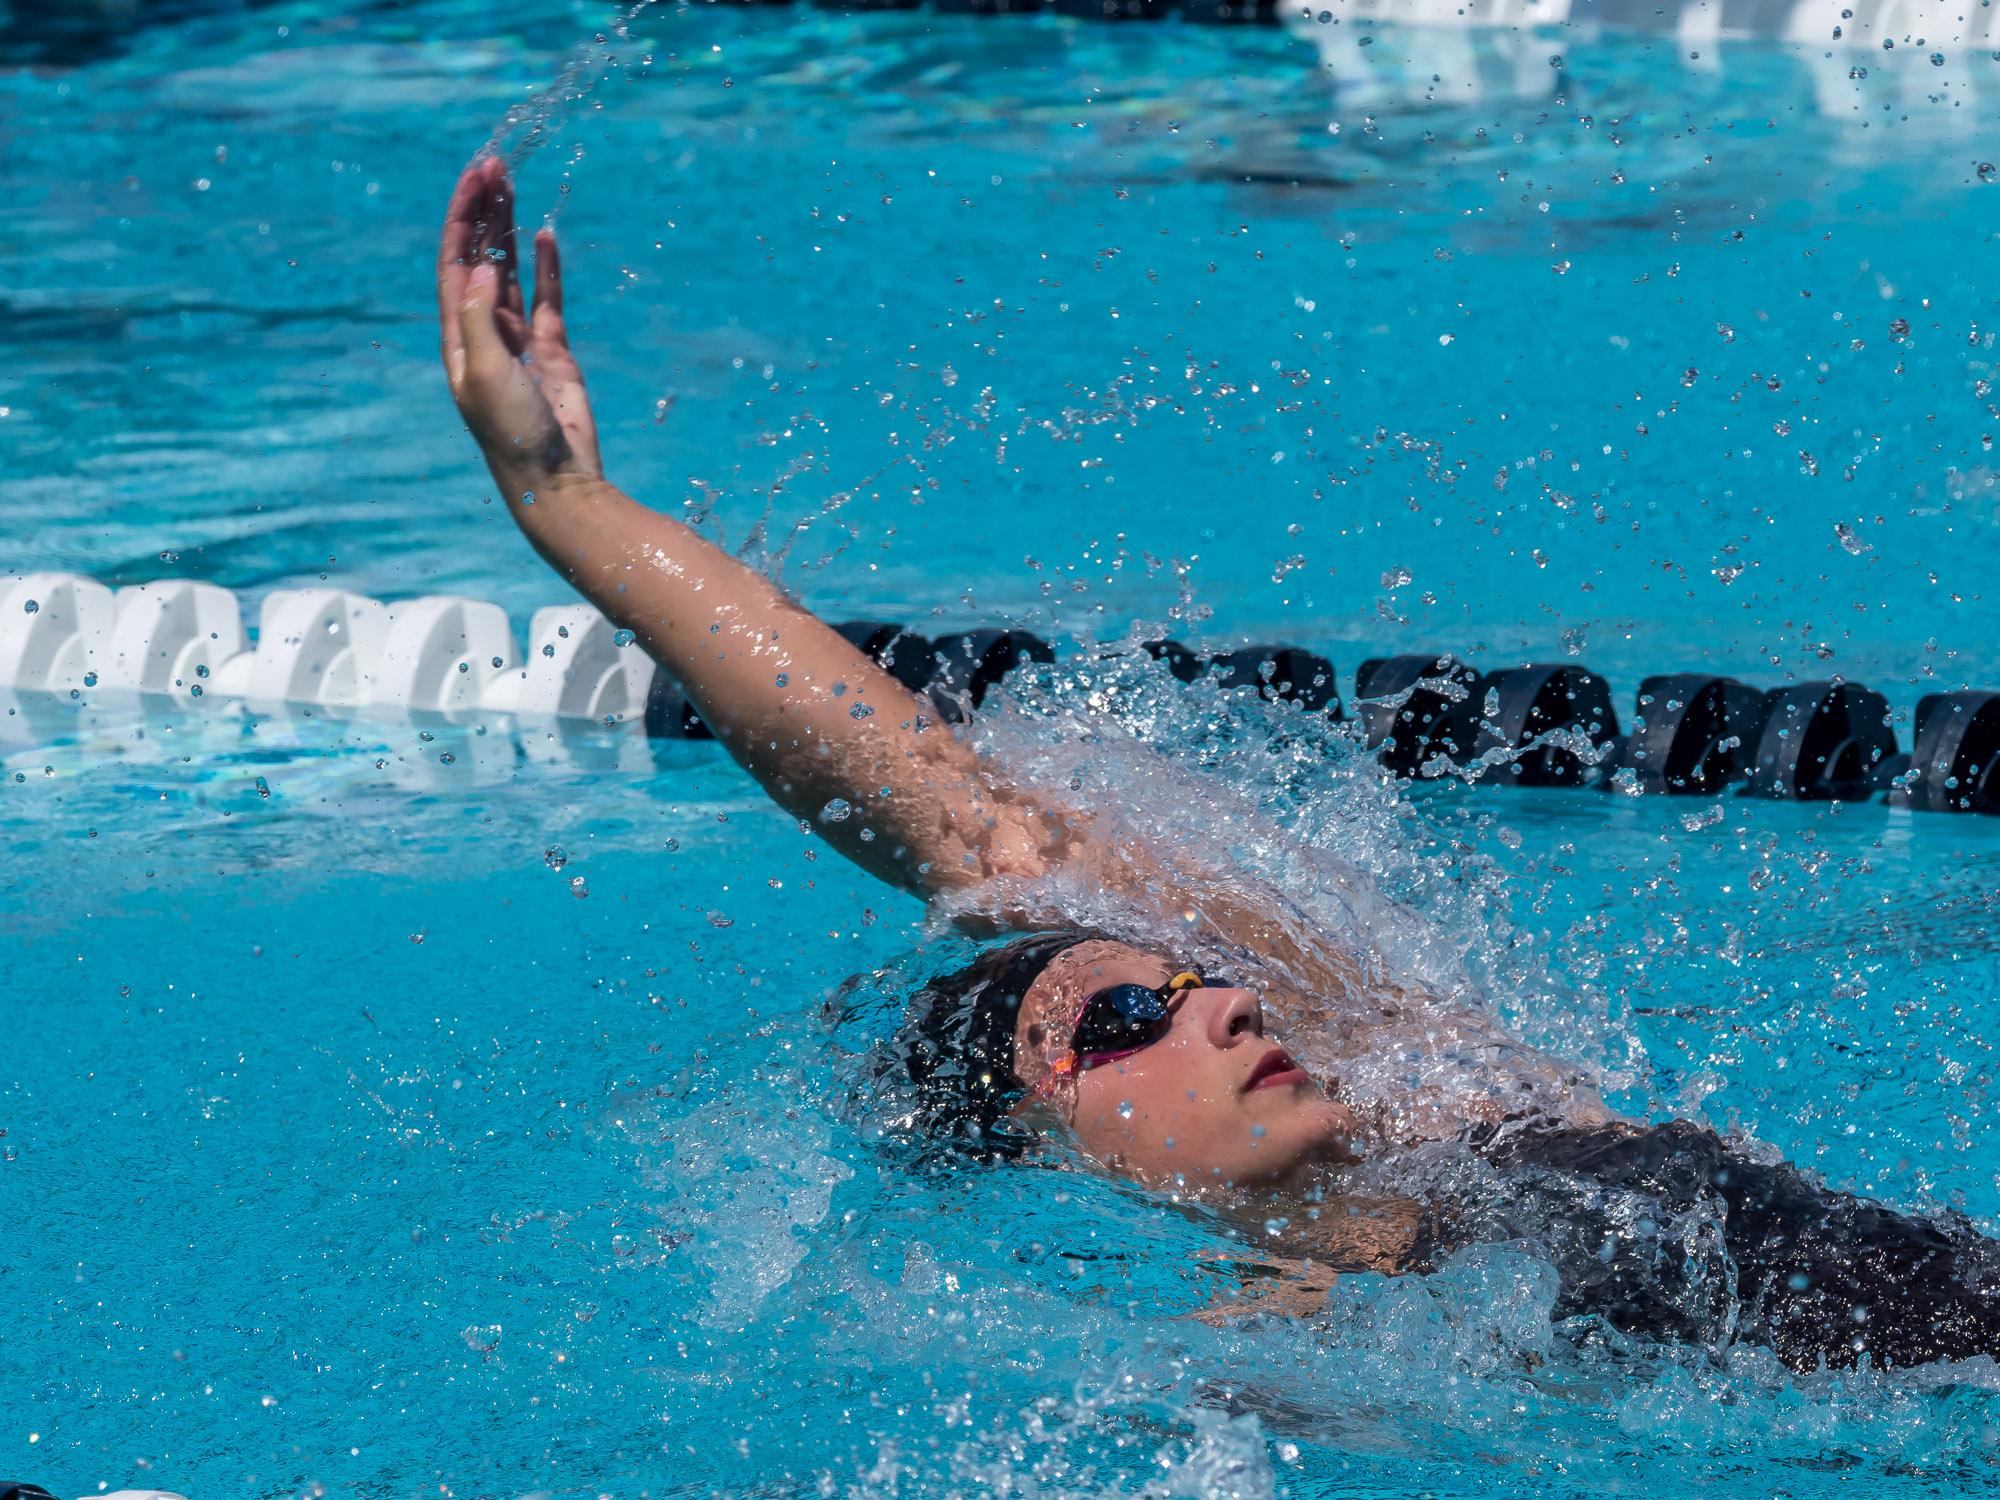 Isabelle Stadden, US National Team Member, Verbally Commits